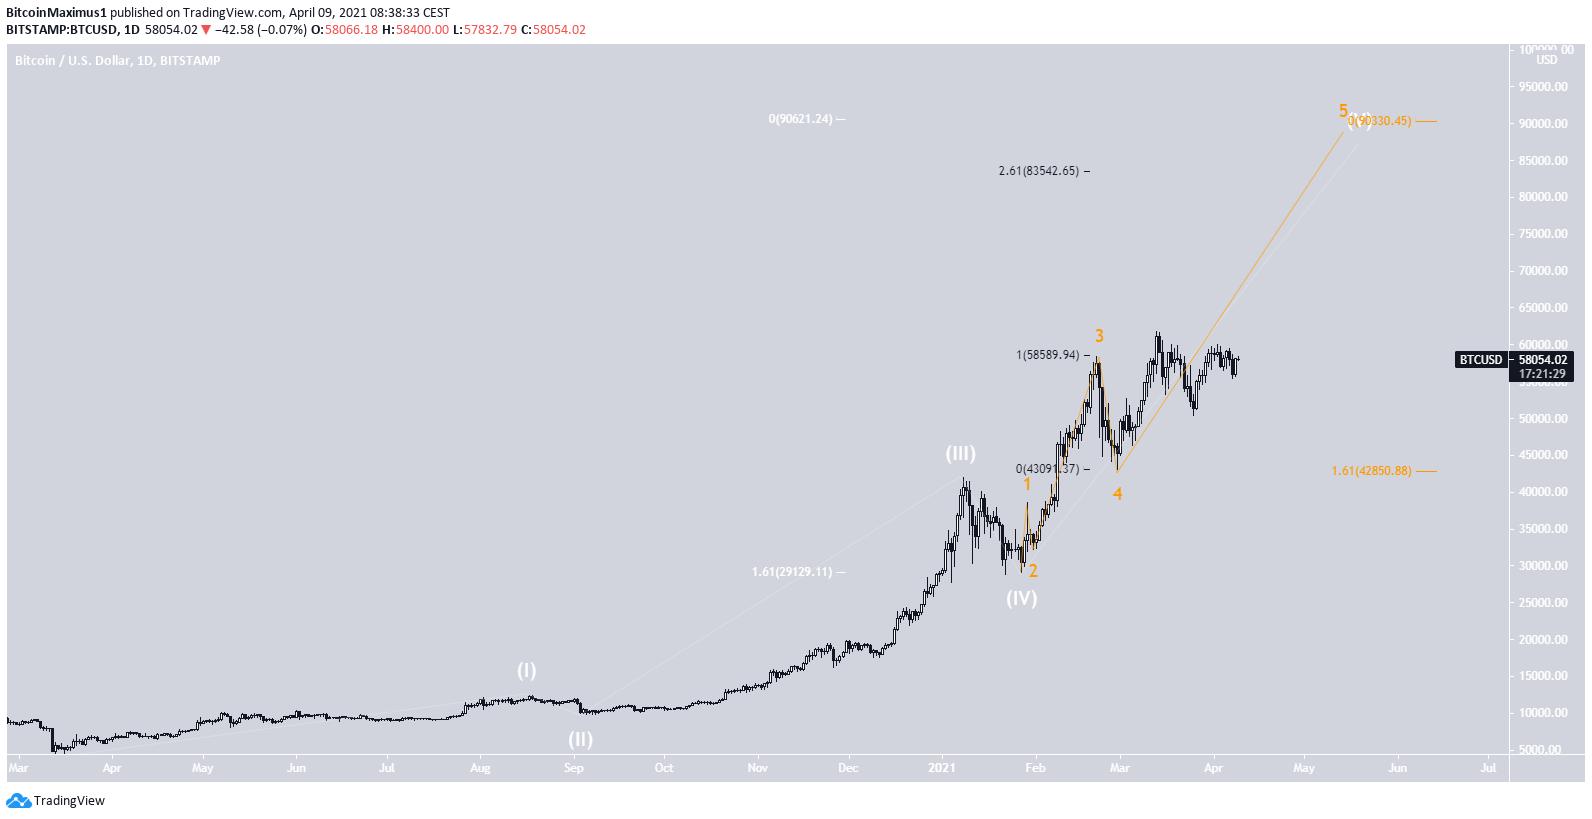 Bitcoin Kurs Wellenanalyse 09.04.2021